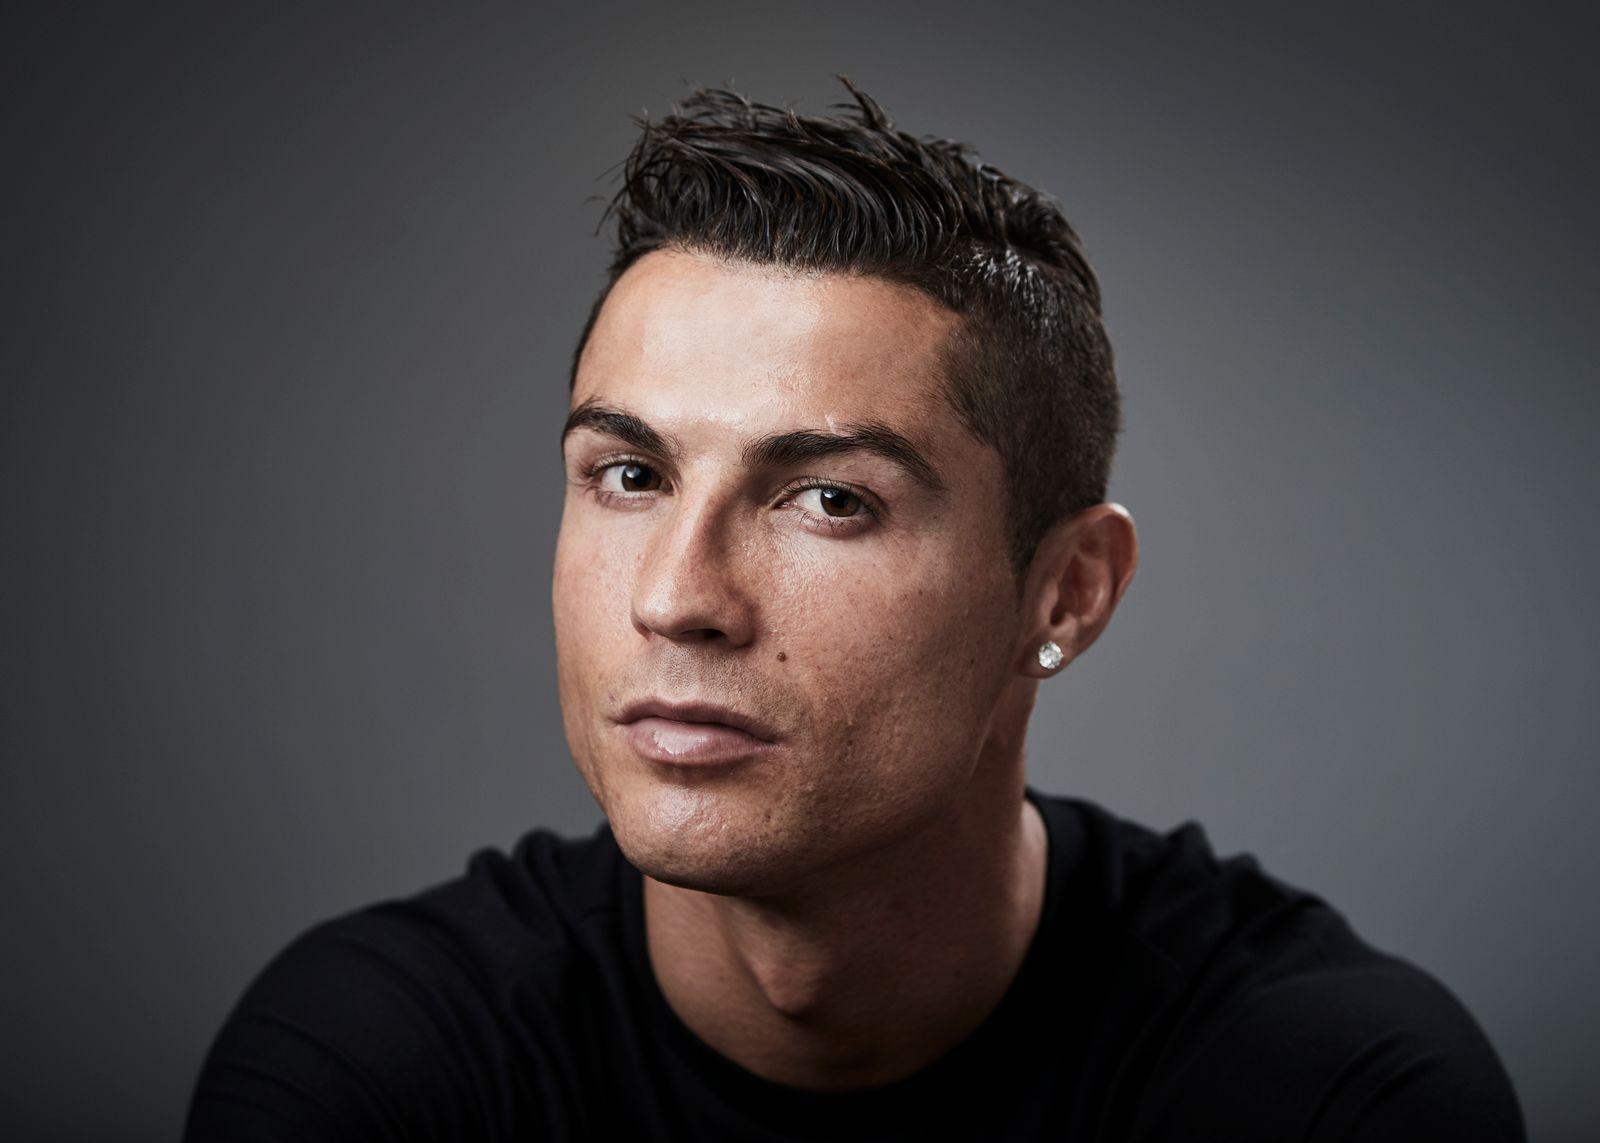 The Best FIFA Football Awards - Portraits